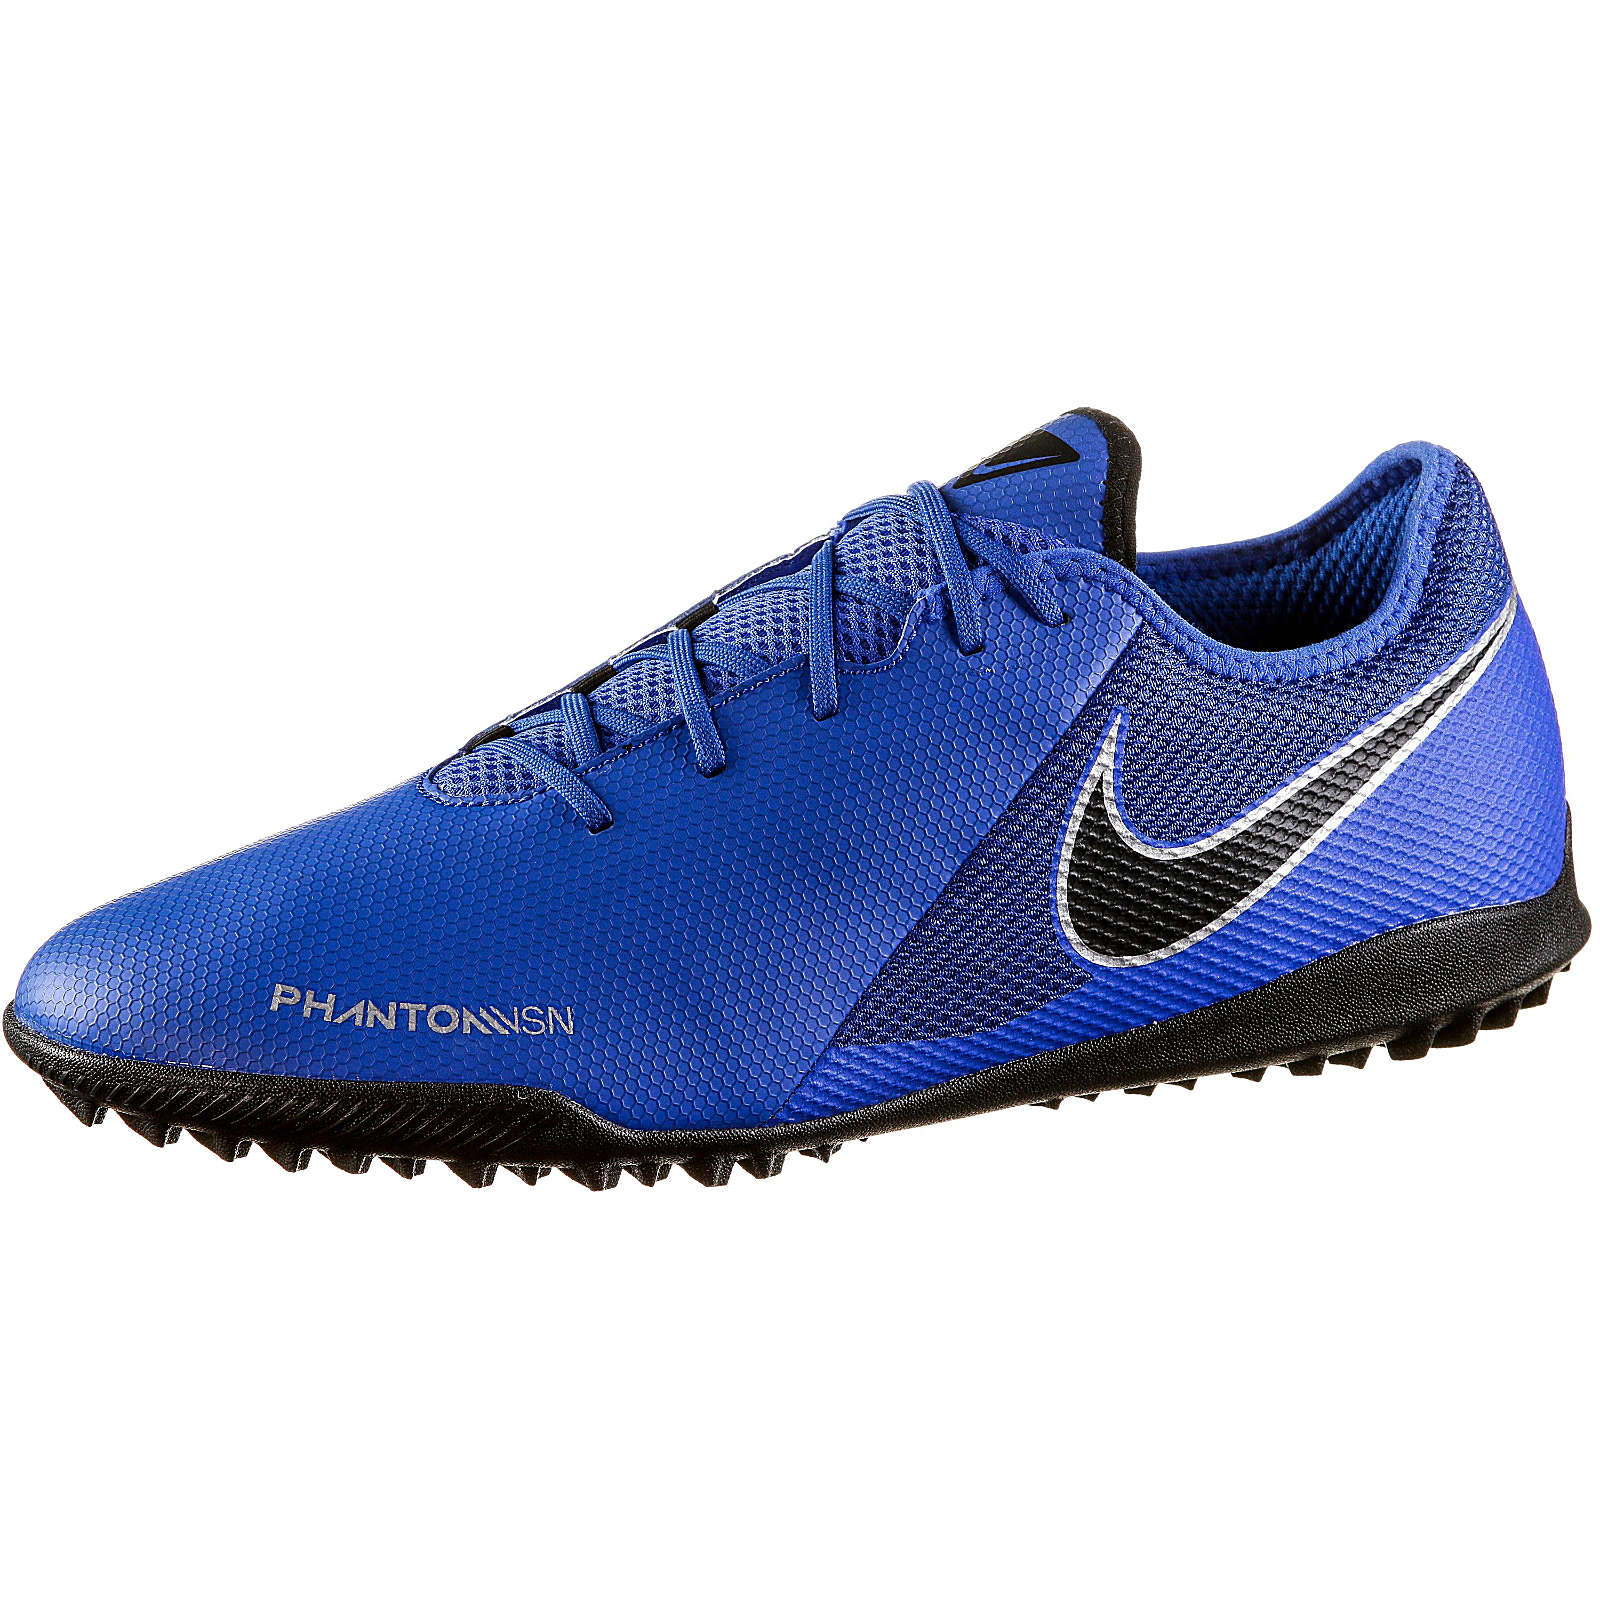 Nike Performance Fußballschuhe PHANTOM VSN ACADEMY TF Fußballschuhe blau Damen Gr. 47,5